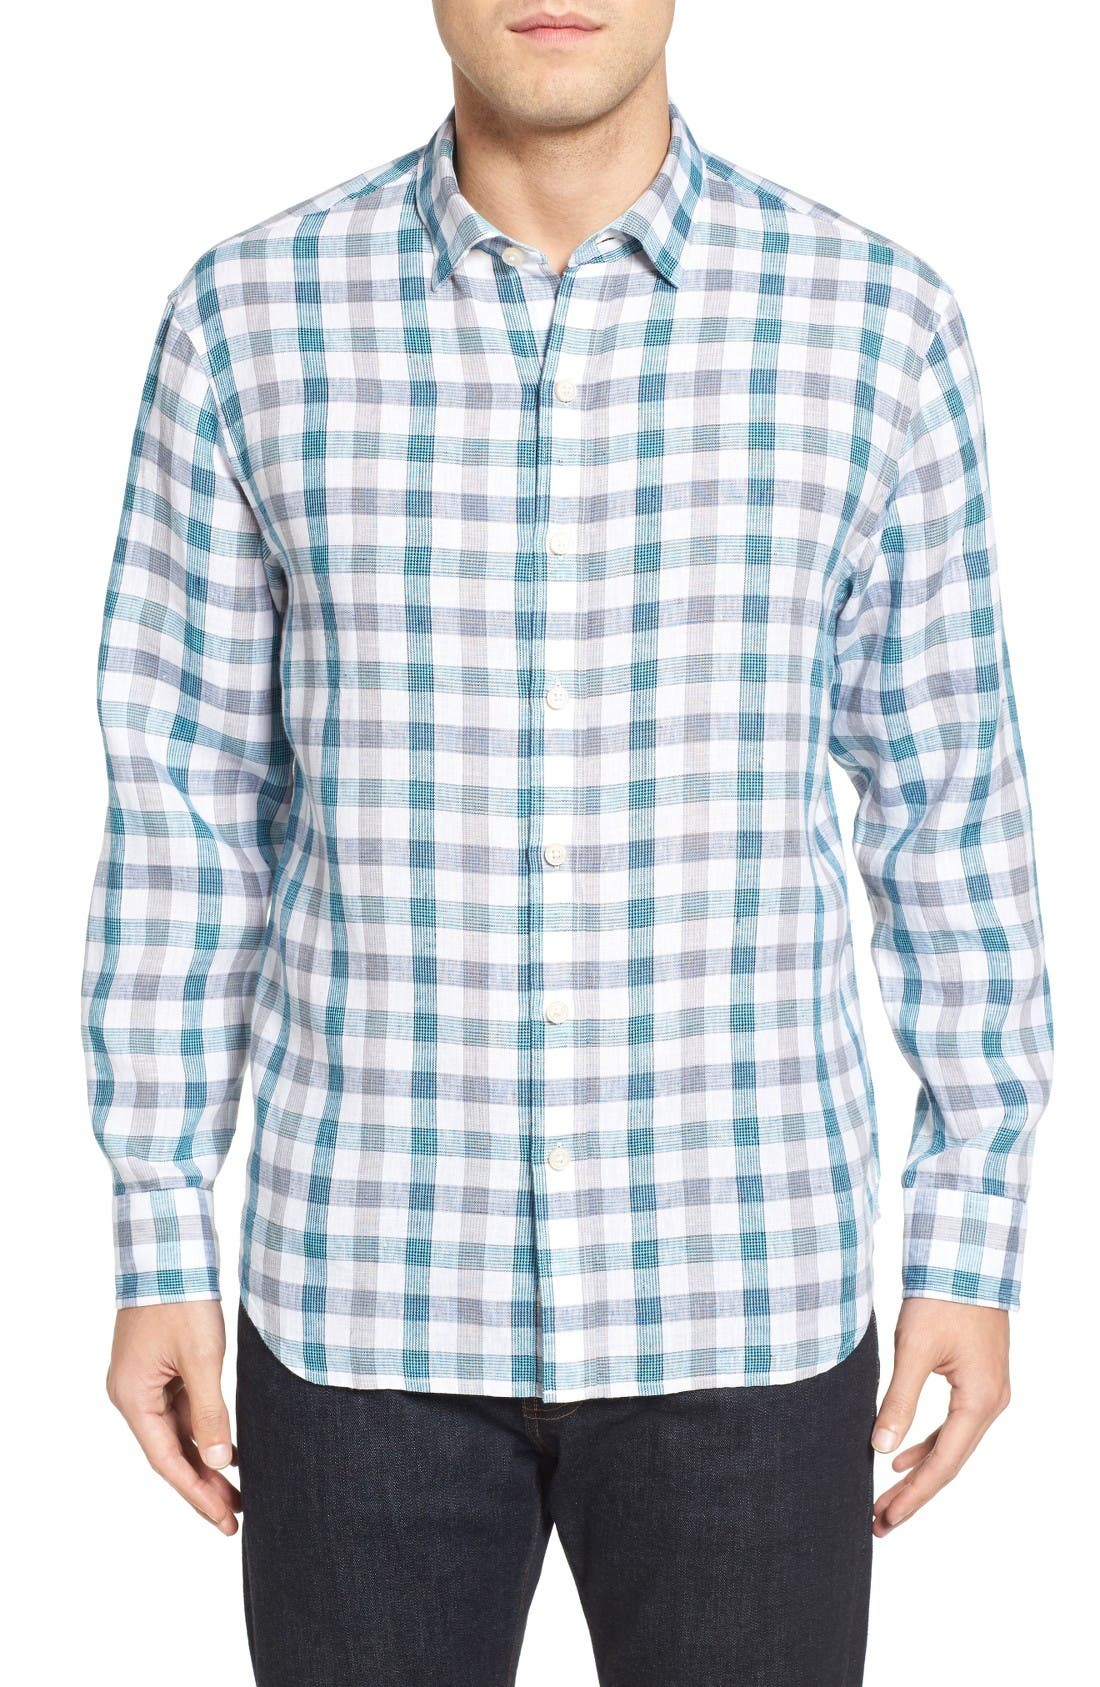 Thira Check Linen Sport Shirt,                         Main,                         color, Download Blue